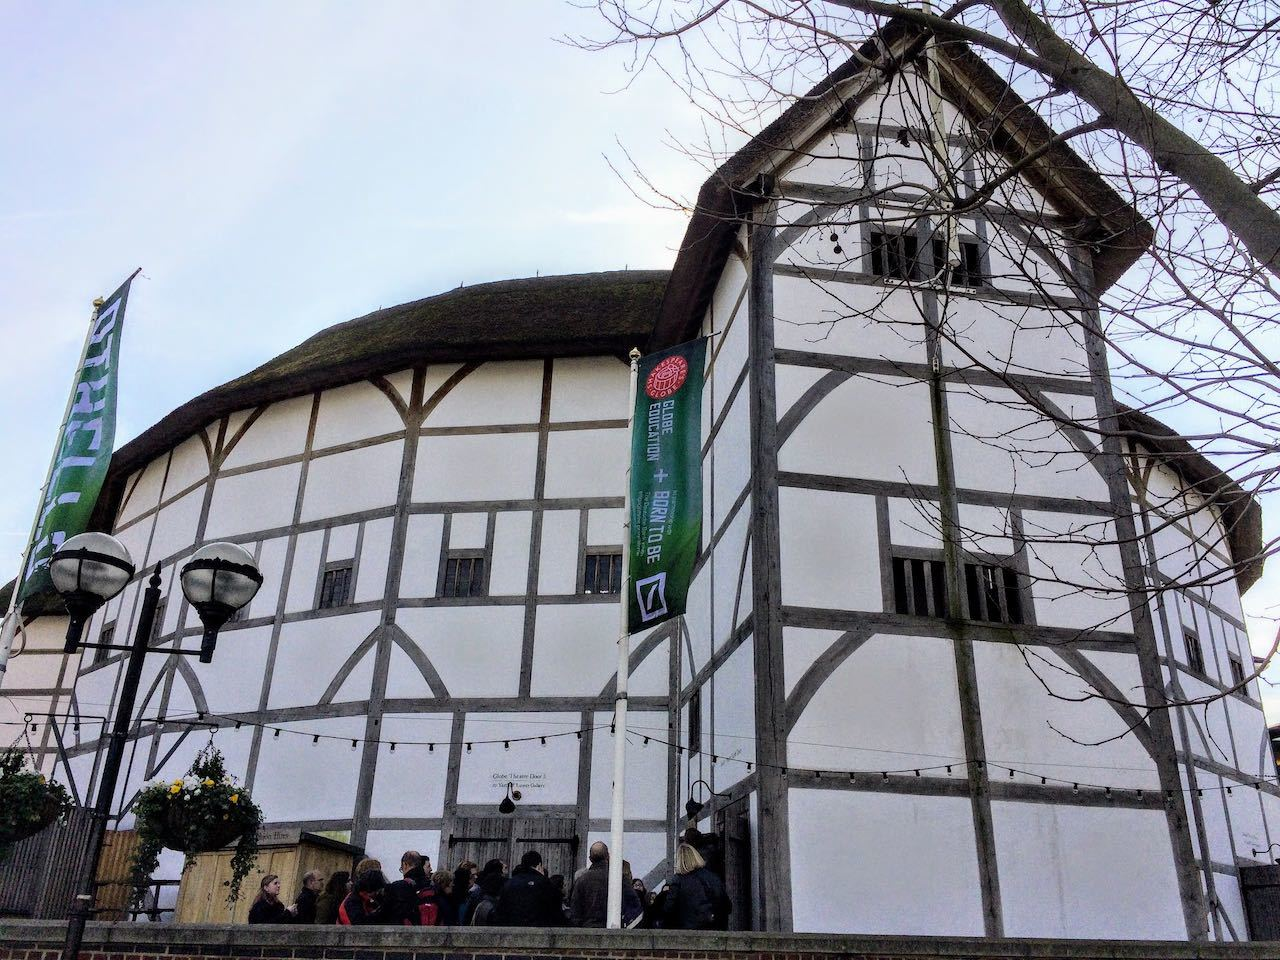 Shakespeares Globe in London